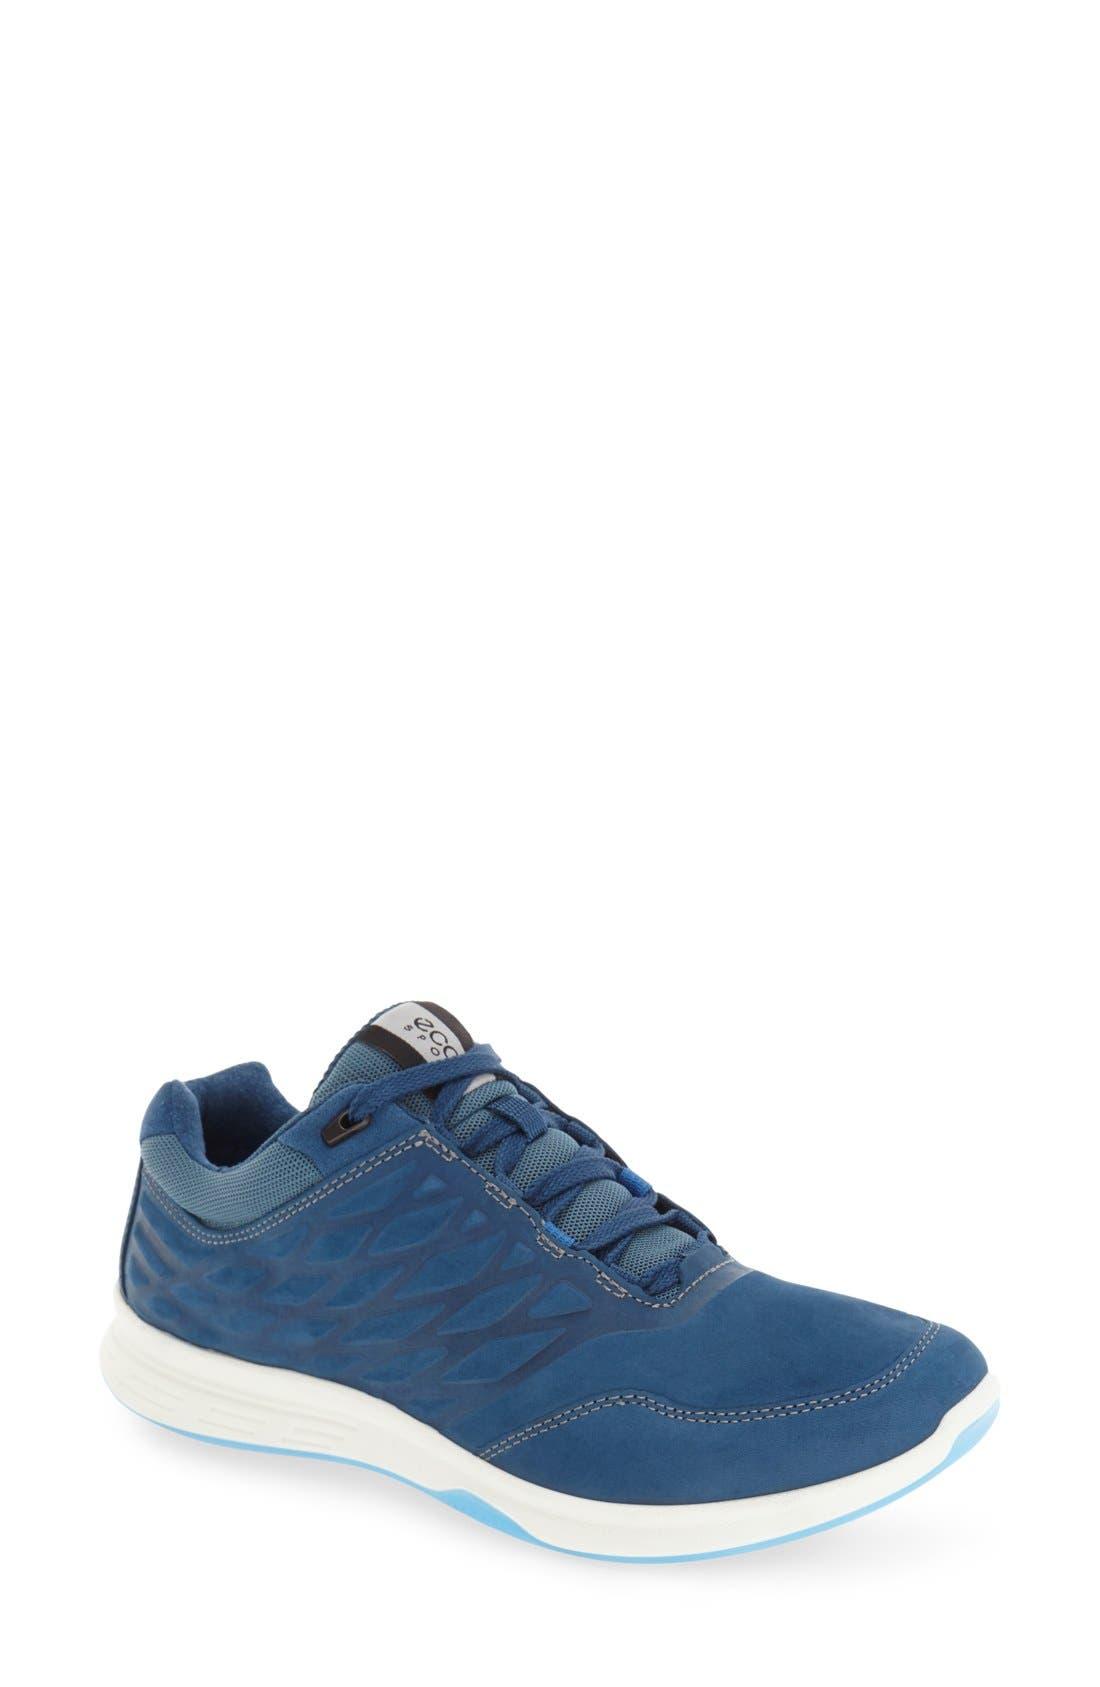 ECCO 'Exceed' Sneaker